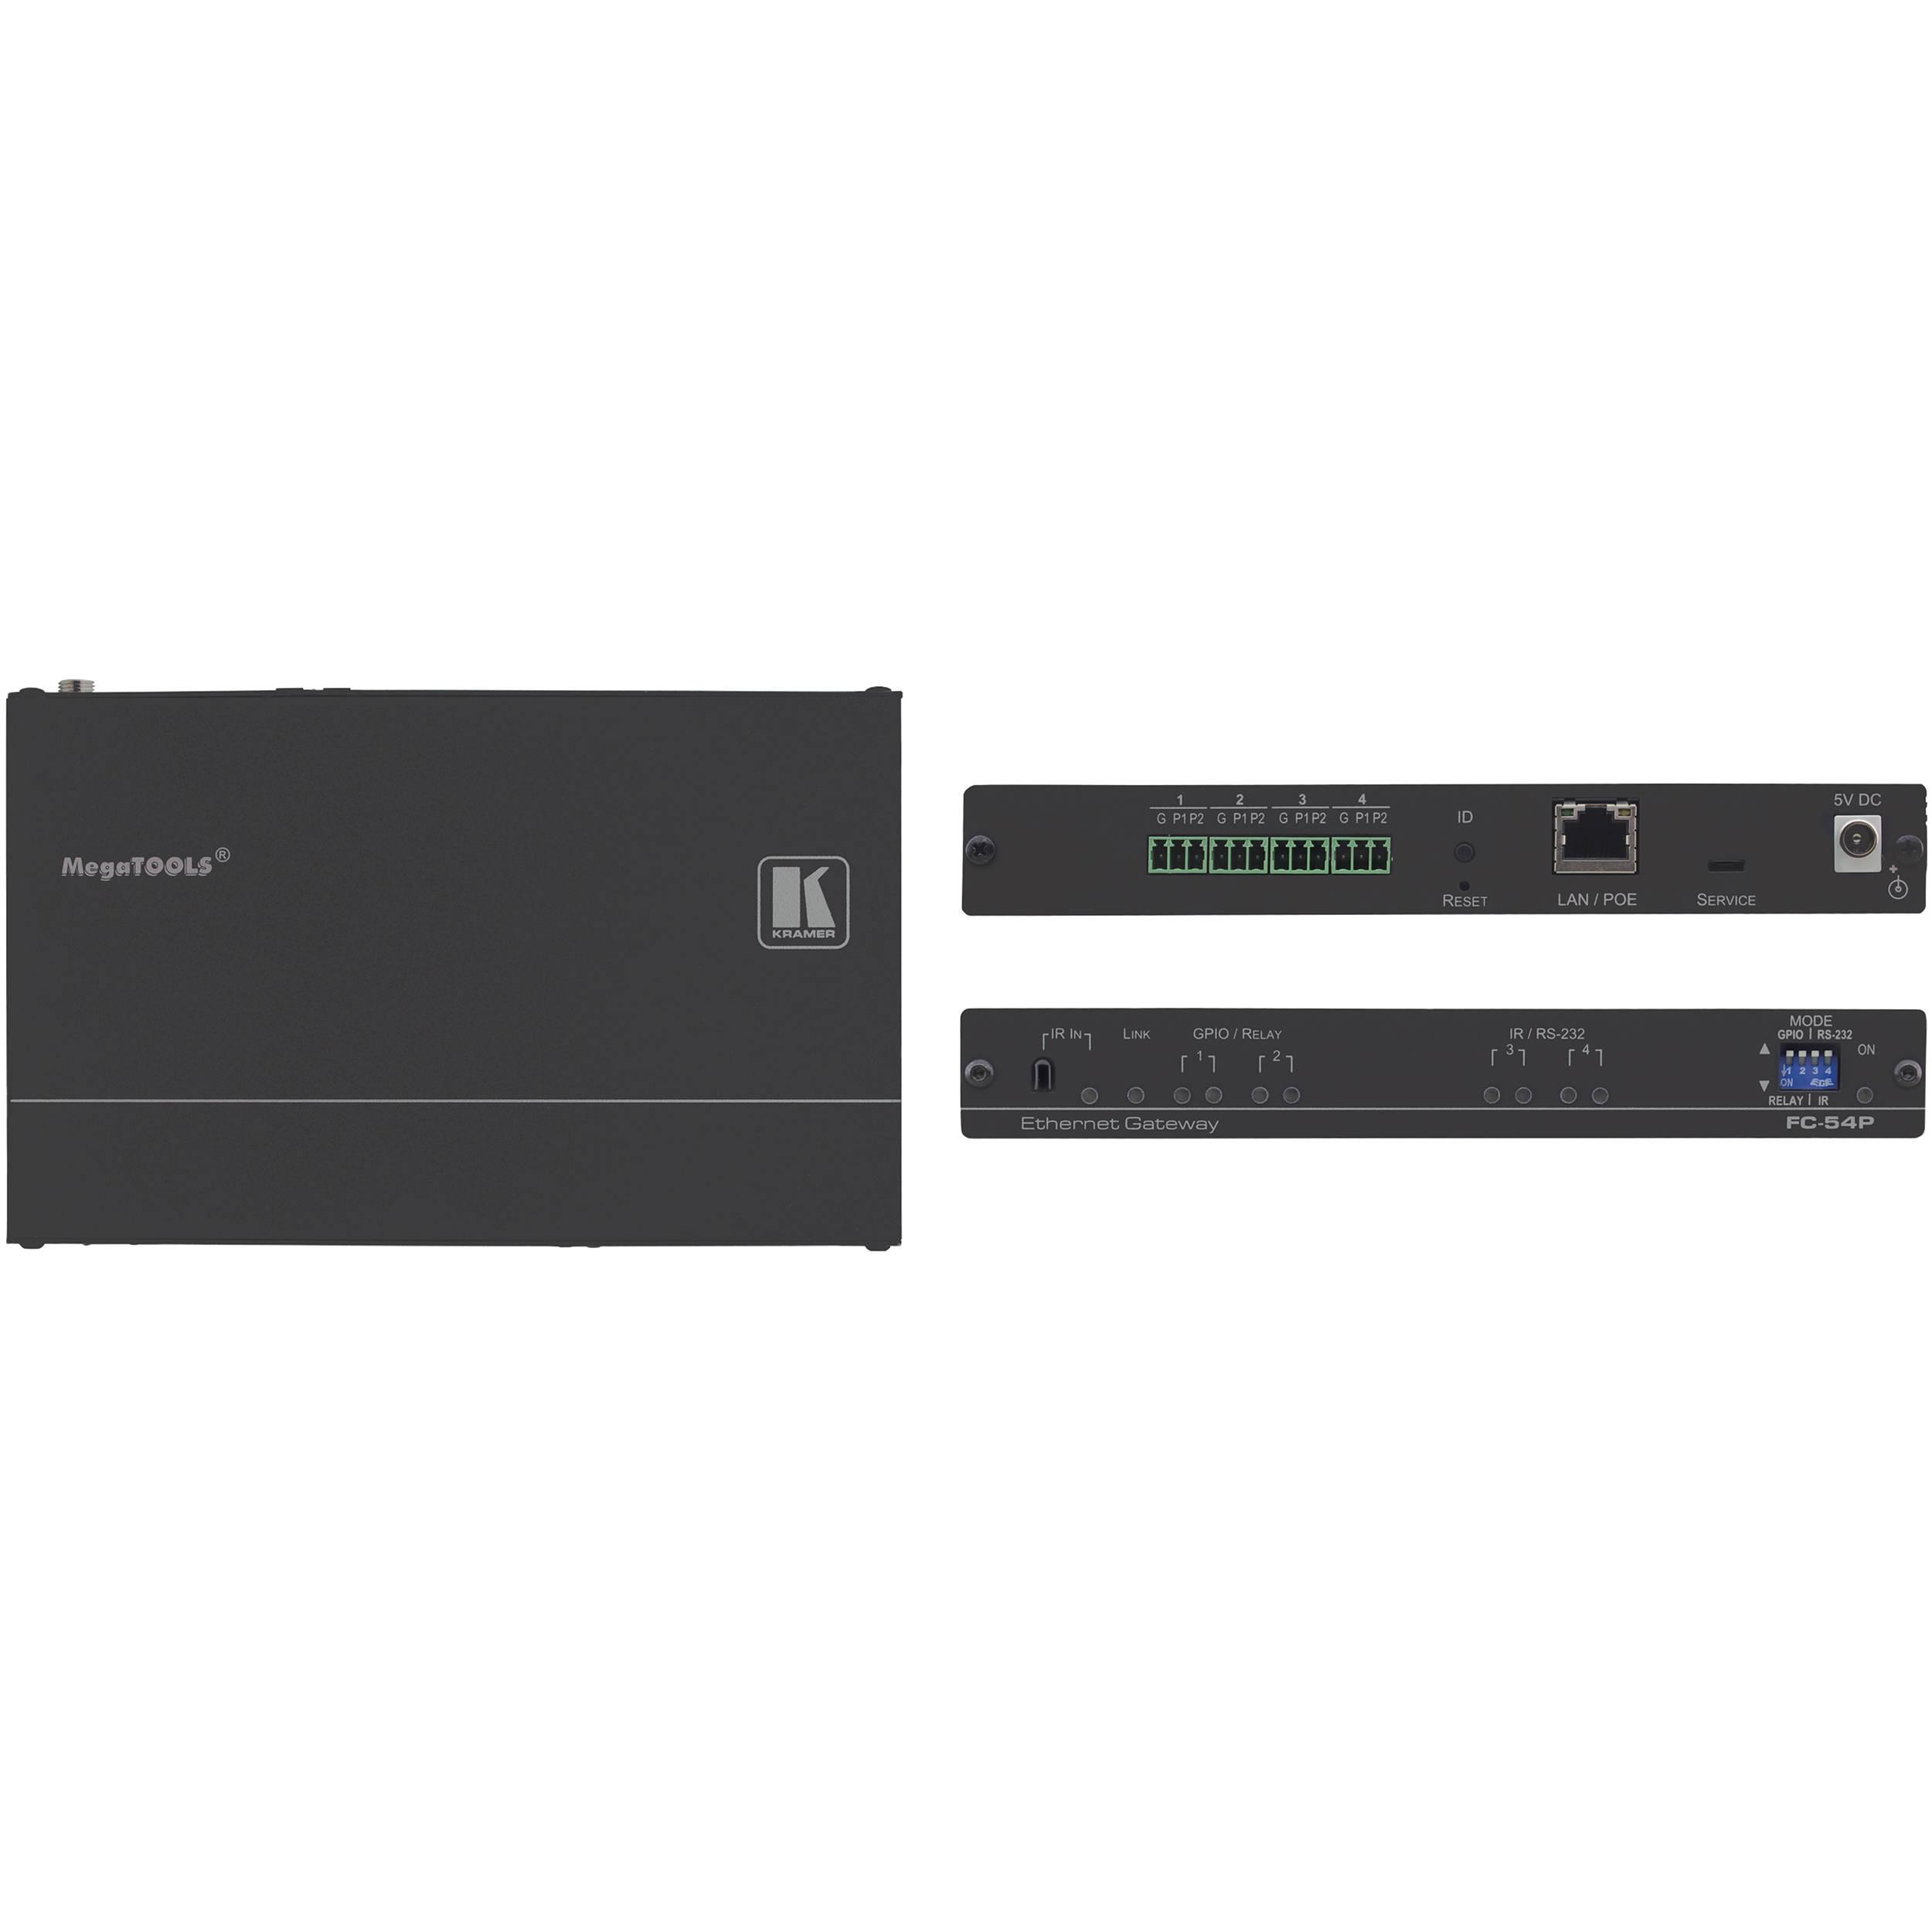 Kramer 4-Port Multi-Function Serial/IR & GPIO/Relay PoE Control Gateway